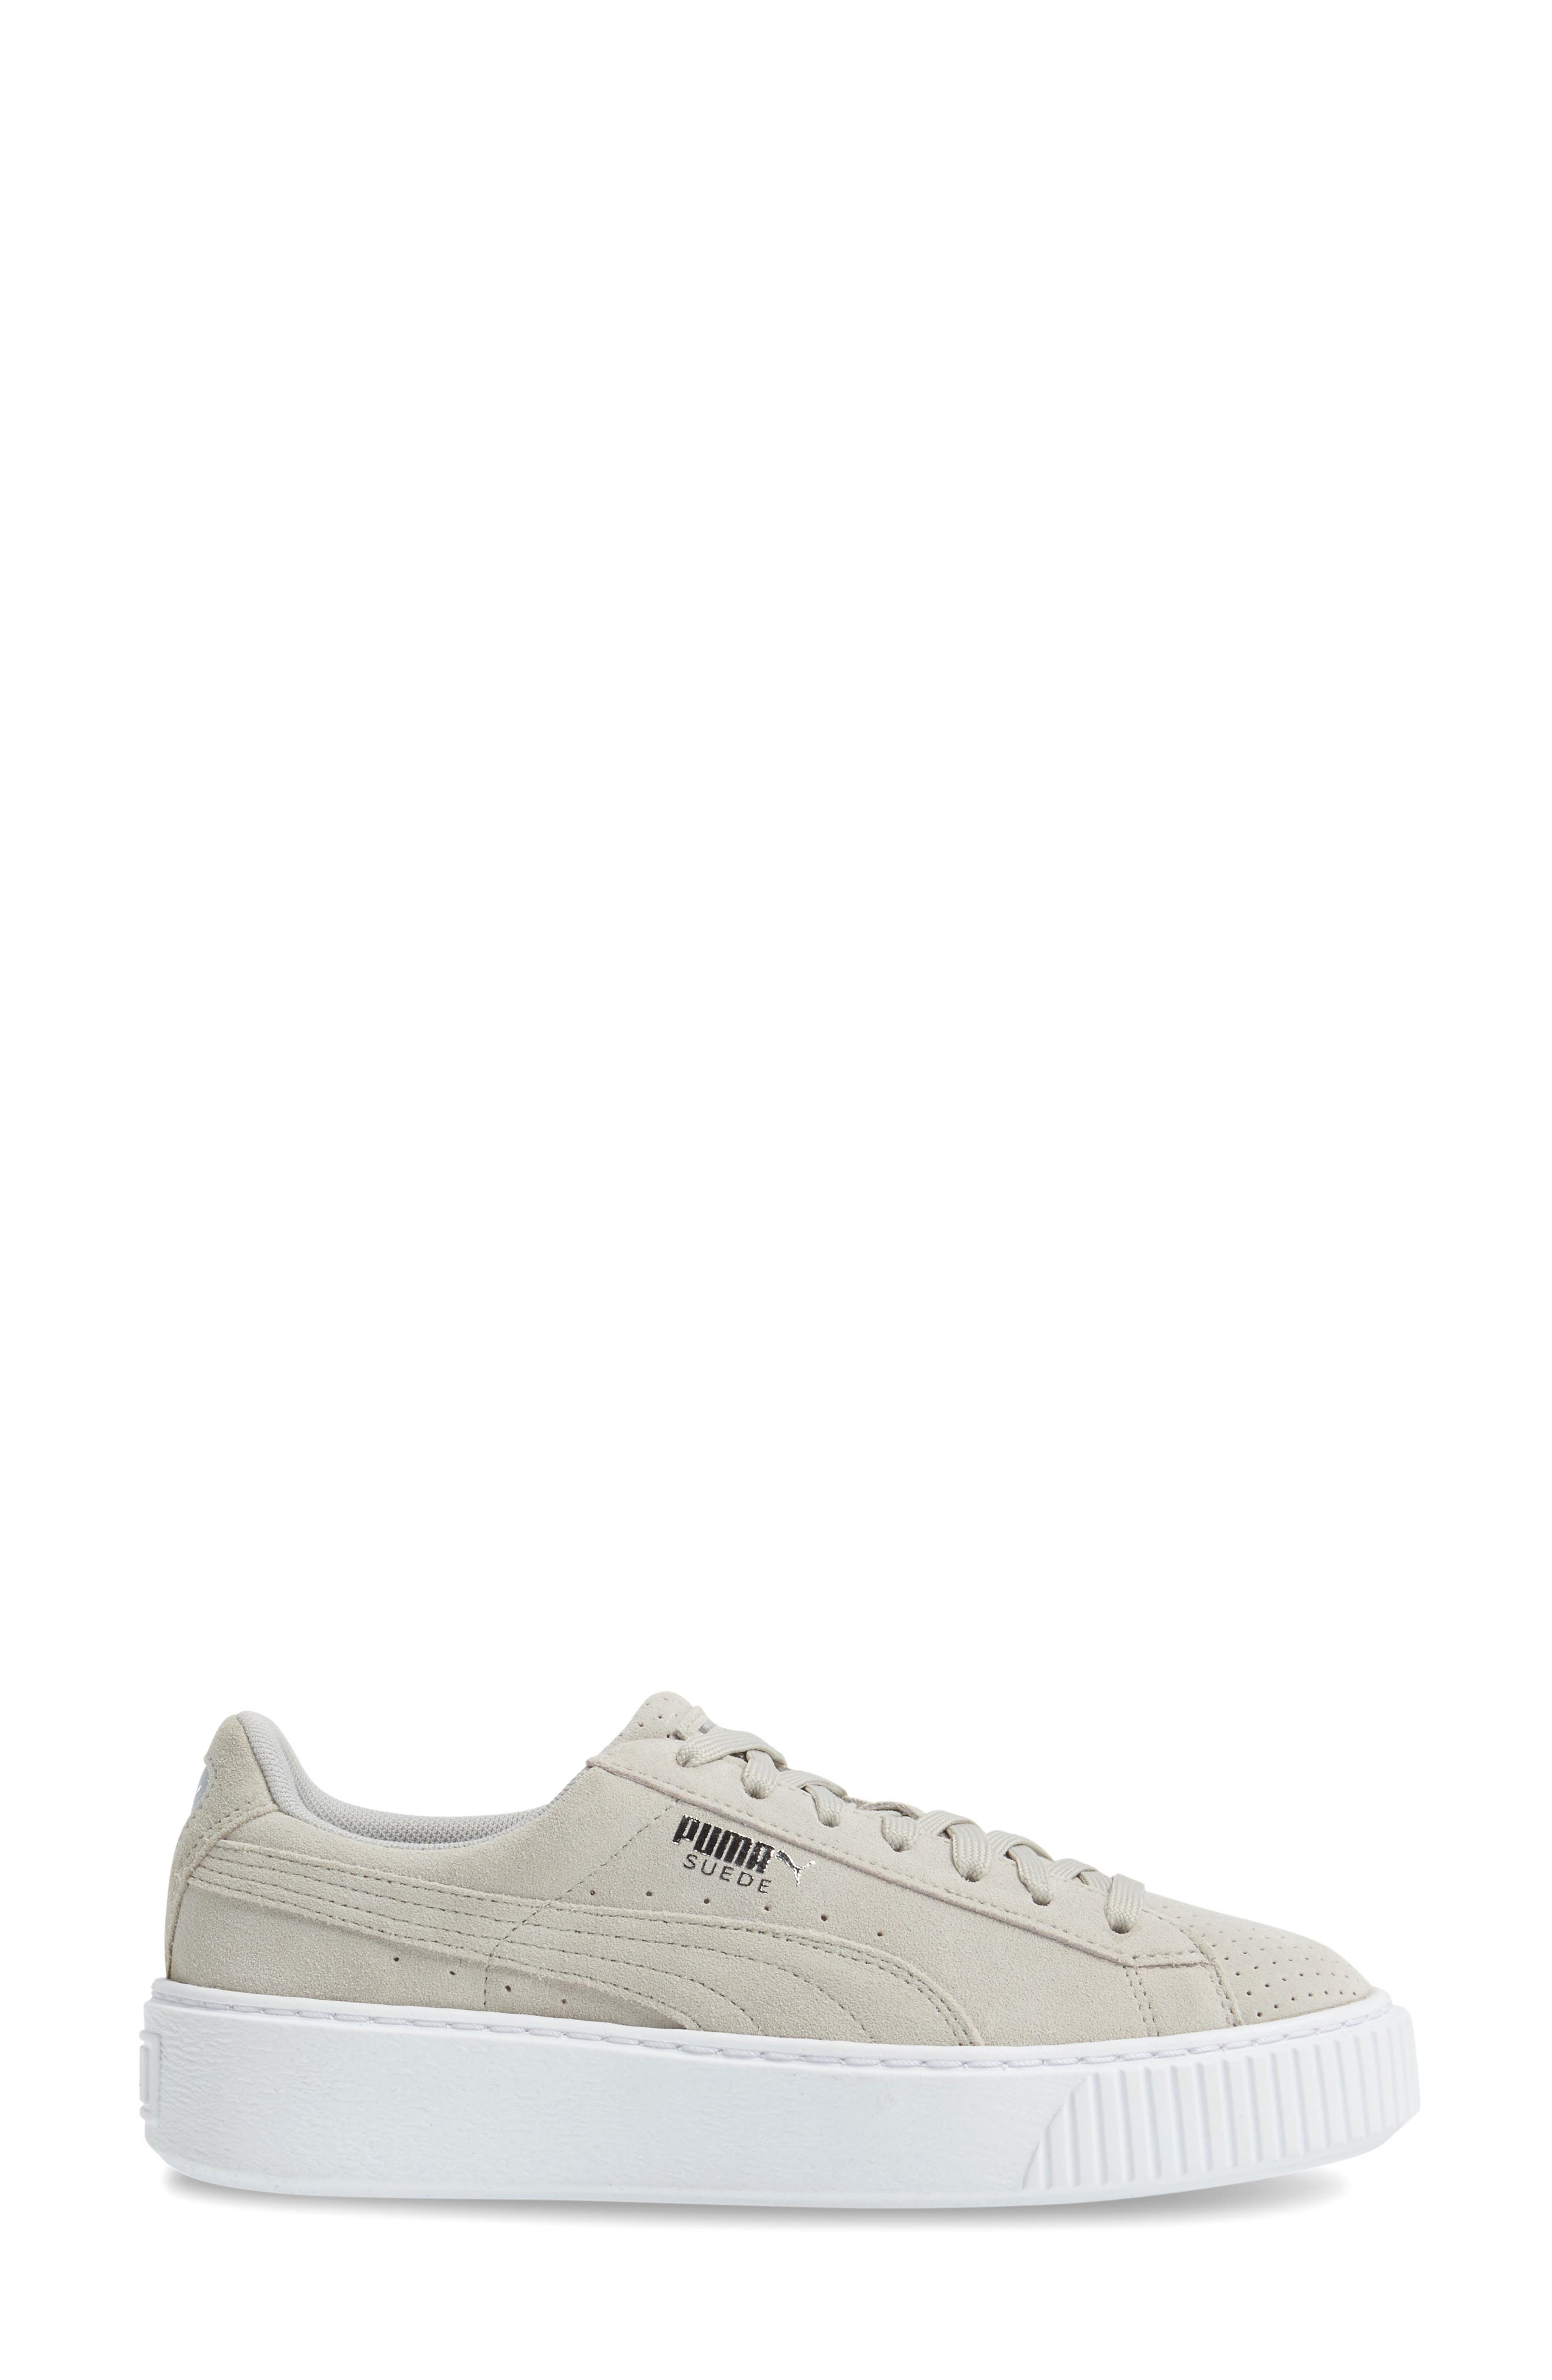 PUMA,                             Basket Platform Sneaker,                             Alternate thumbnail 3, color,                             060